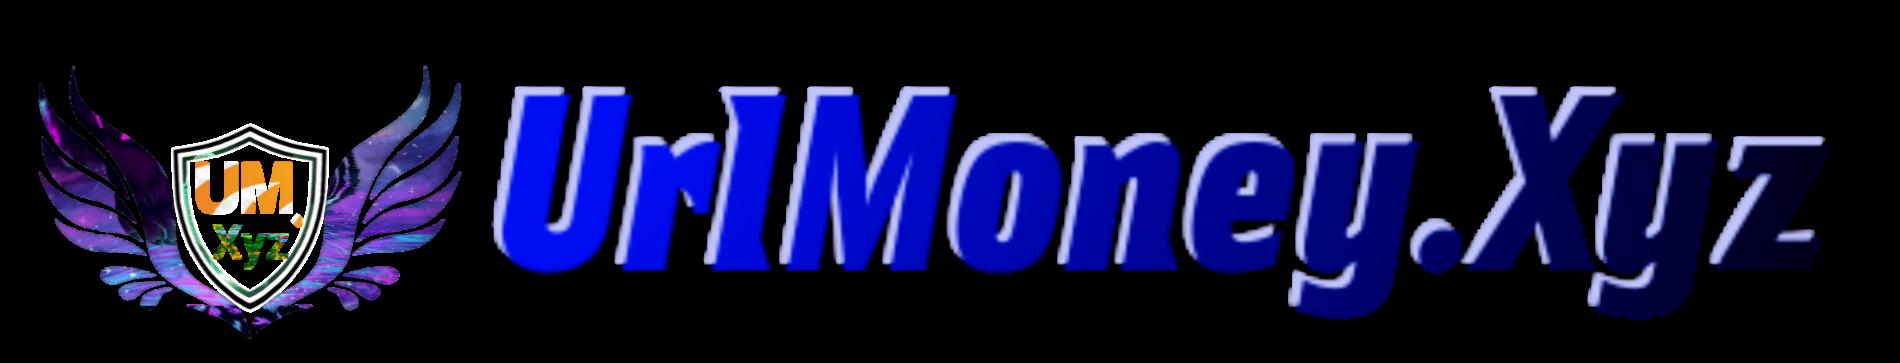 UrlMoney